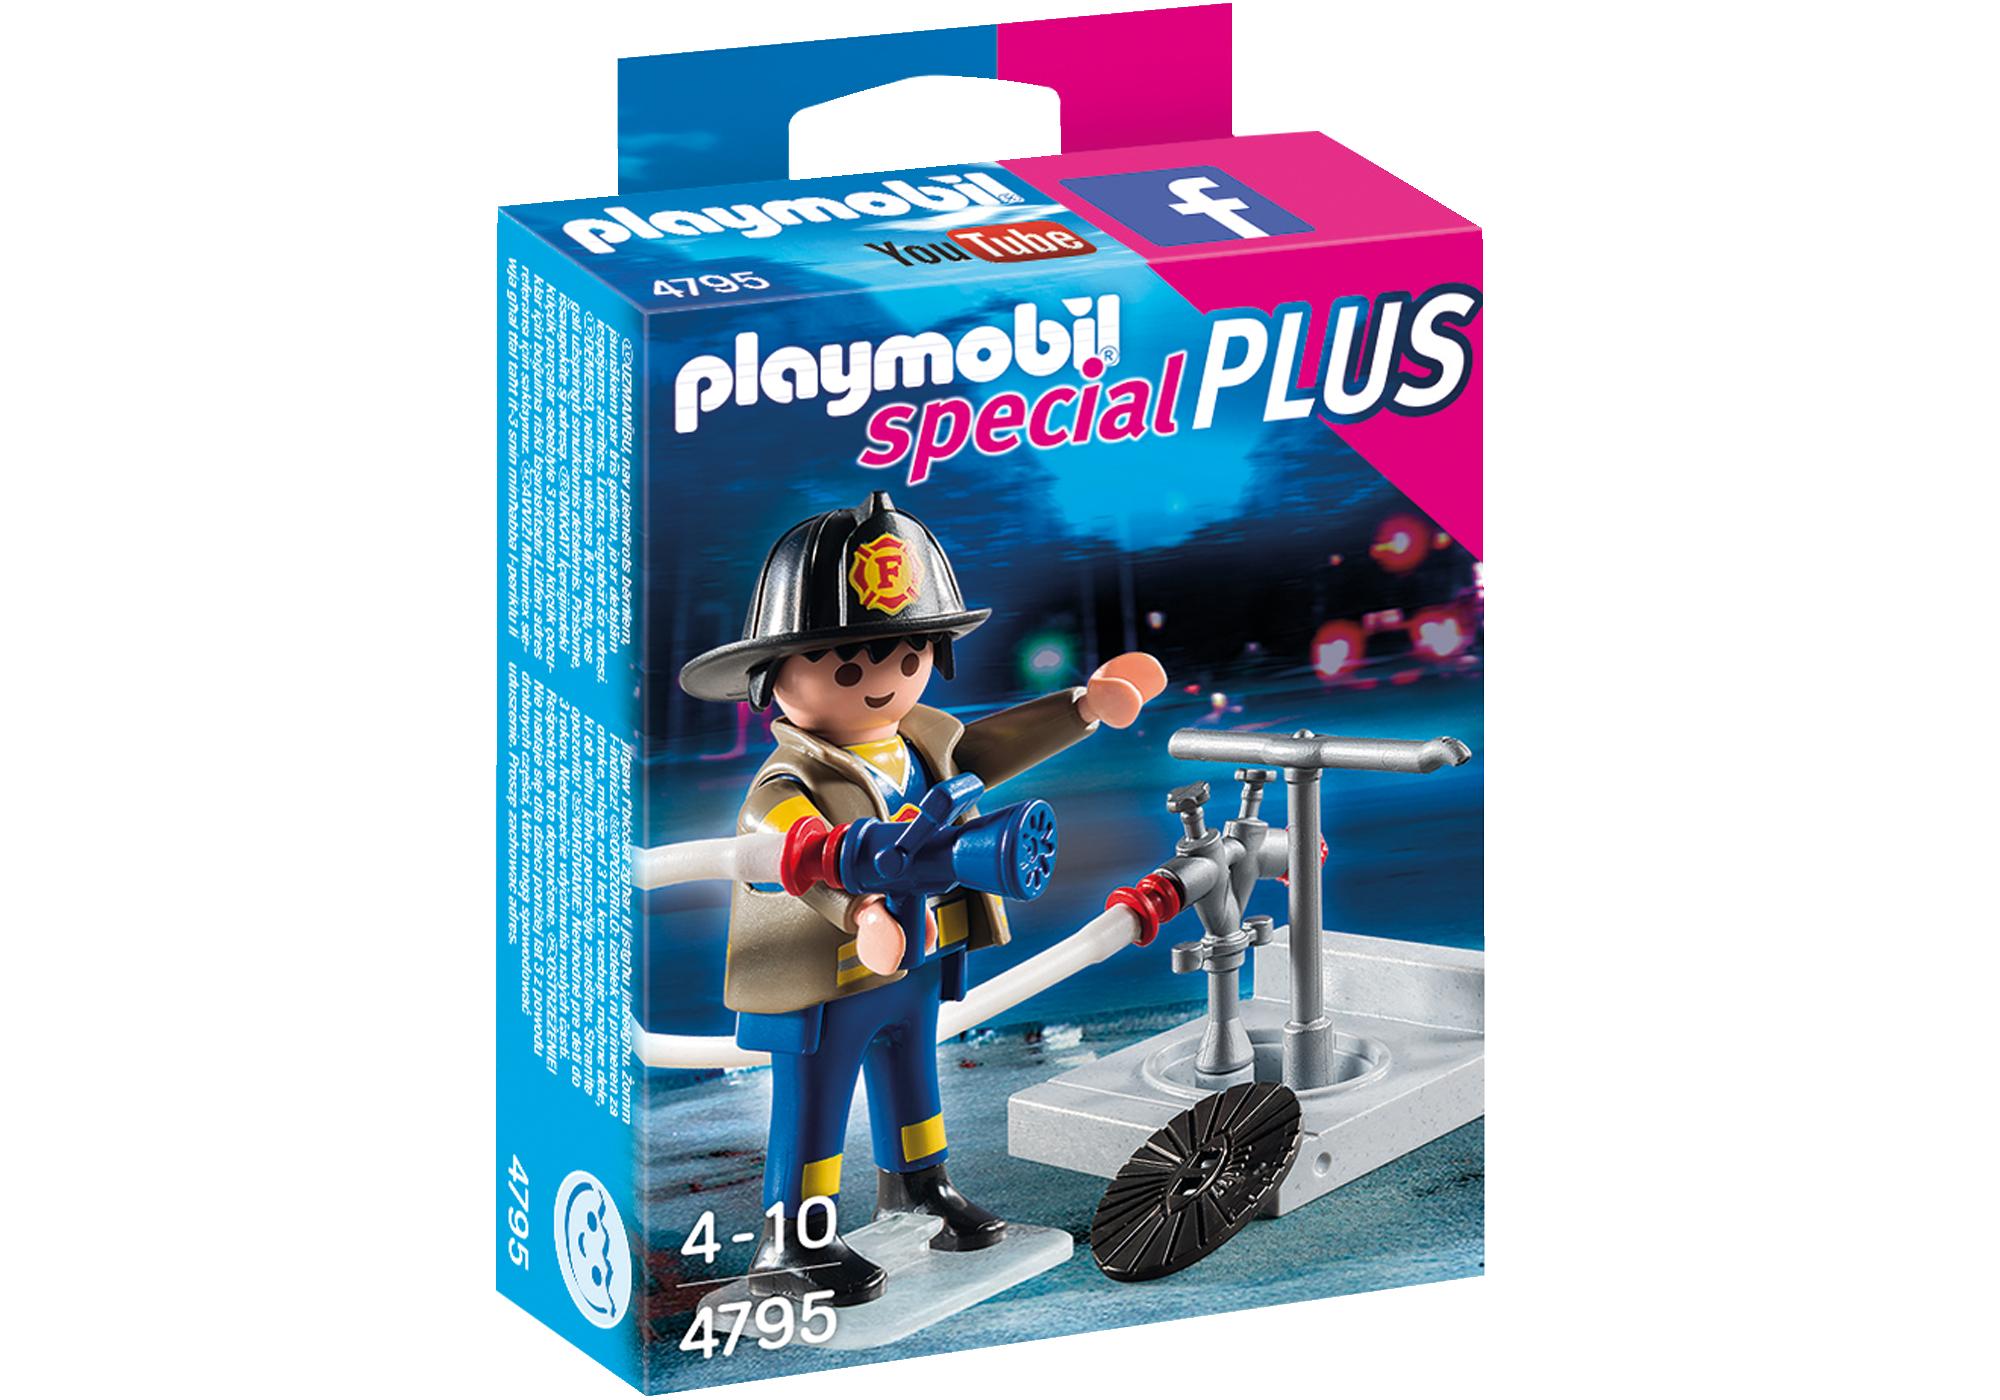 http://media.playmobil.com/i/playmobil/4795_product_box_front